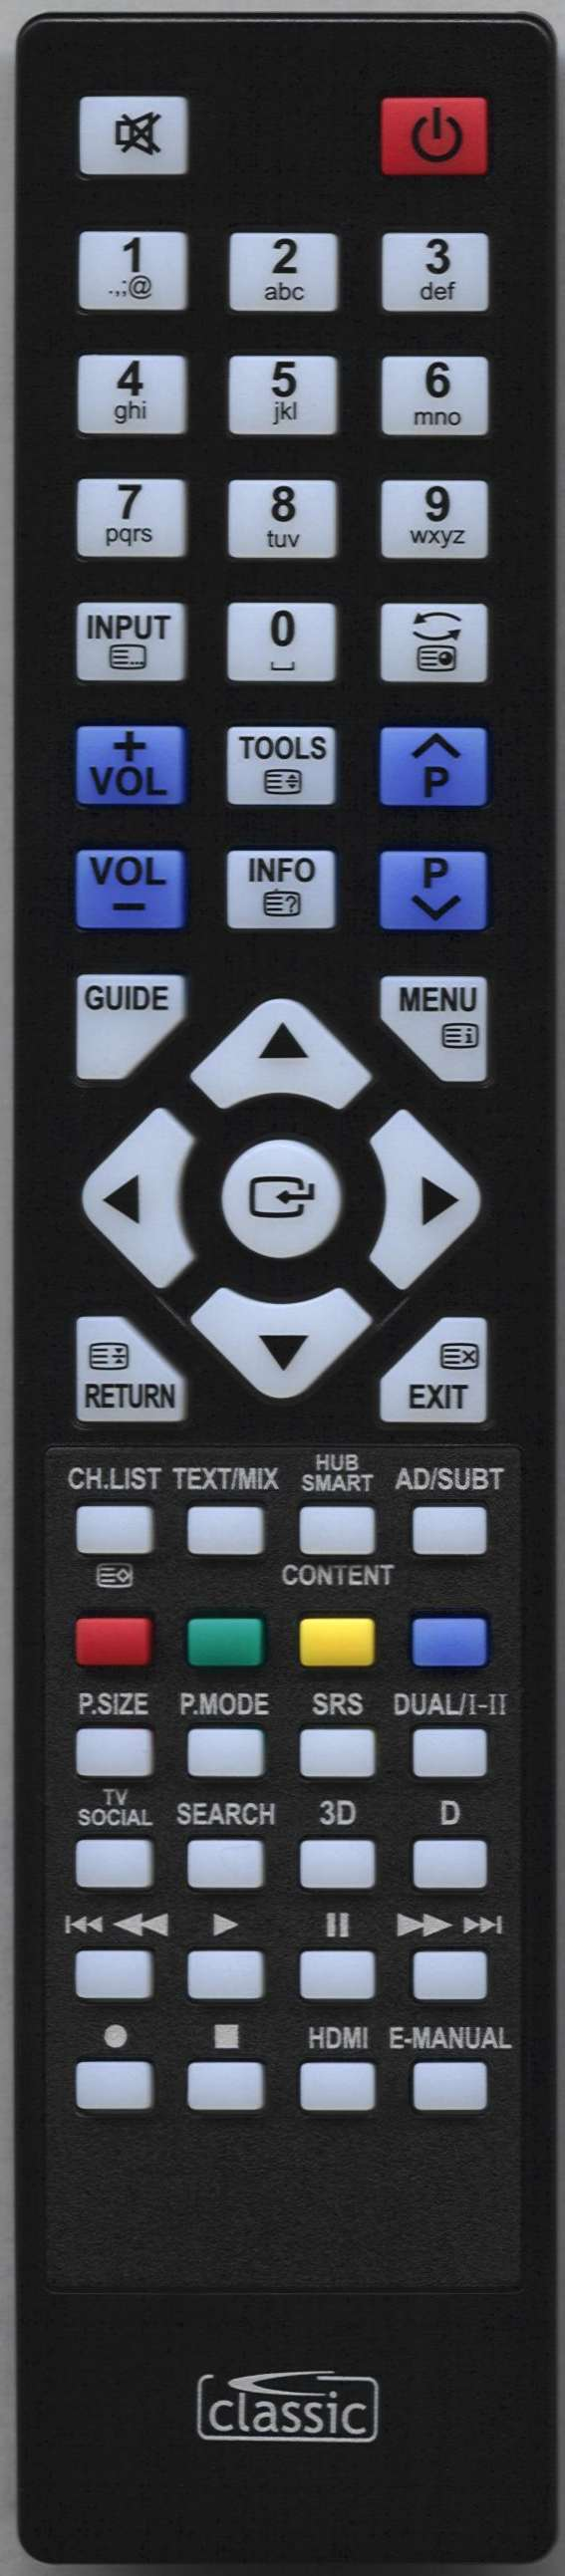 SAMSUNG UE32EH5000KXXU Remote Control Alternative